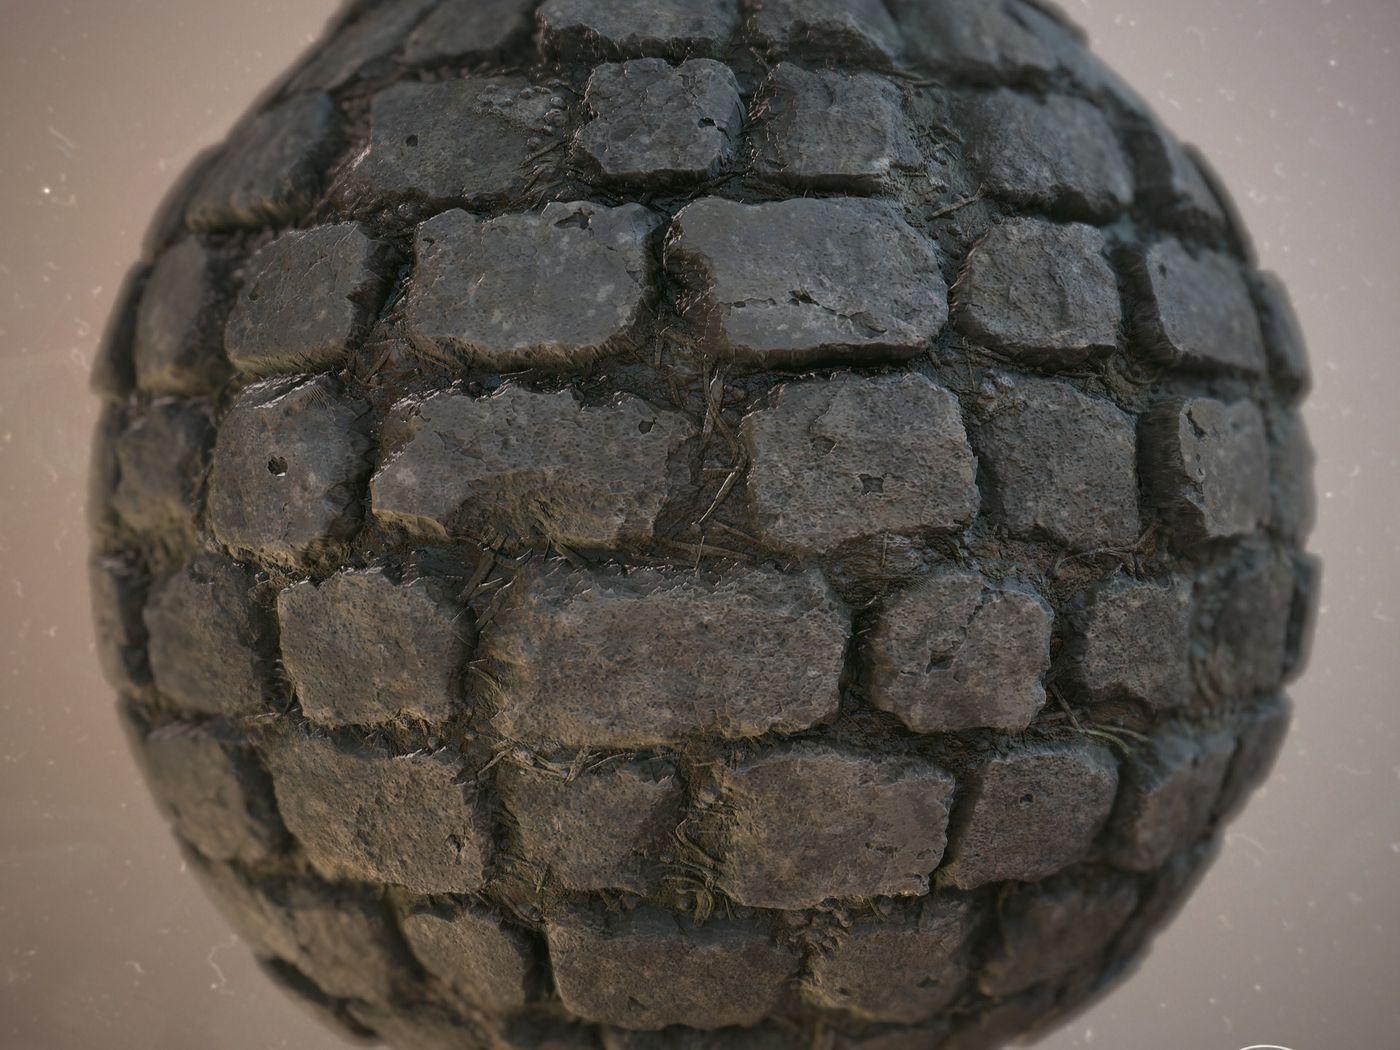 Cobble Stone Material